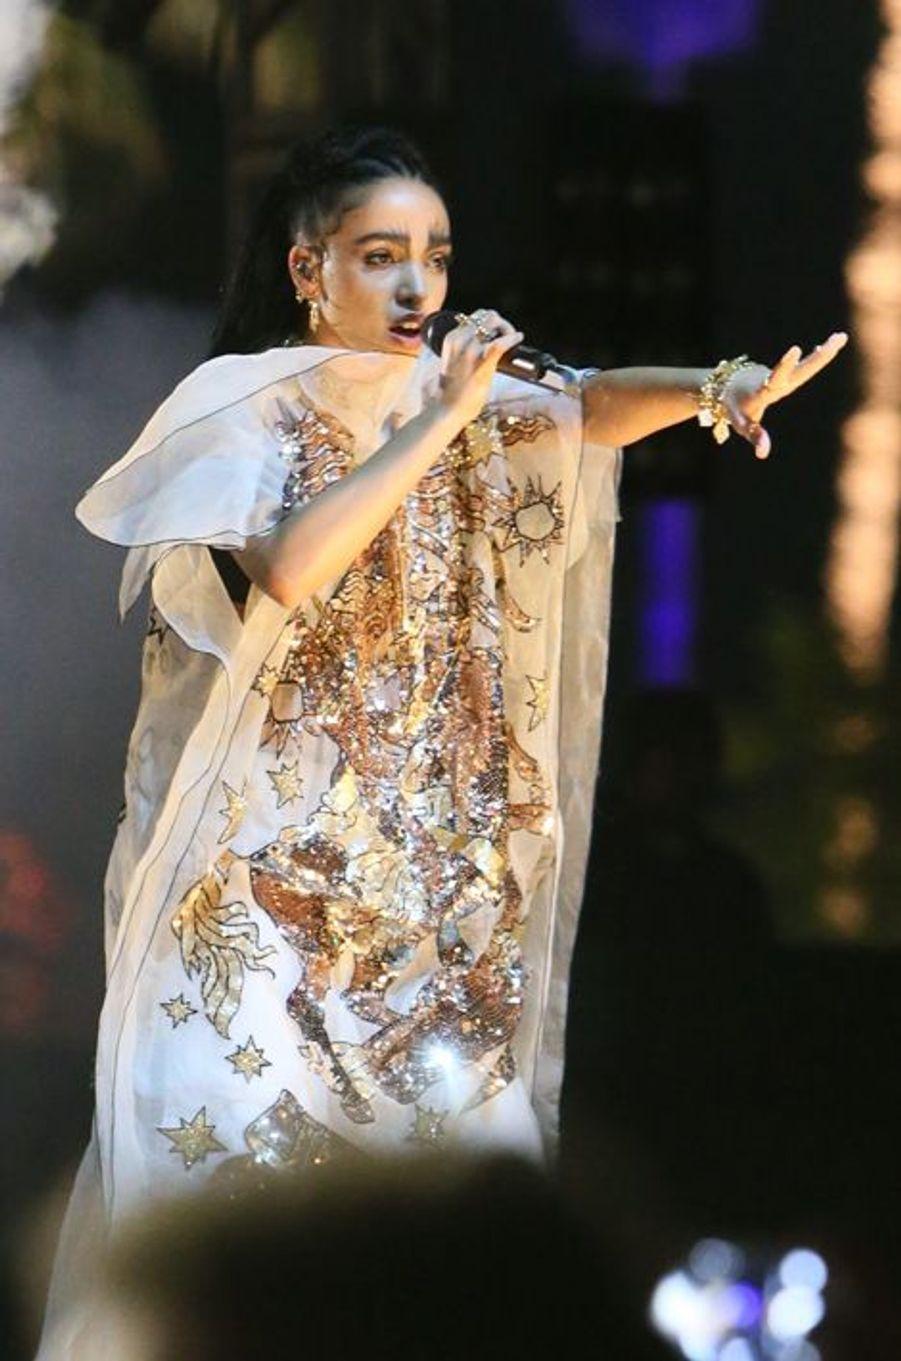 La chanteuse FKA Twigs